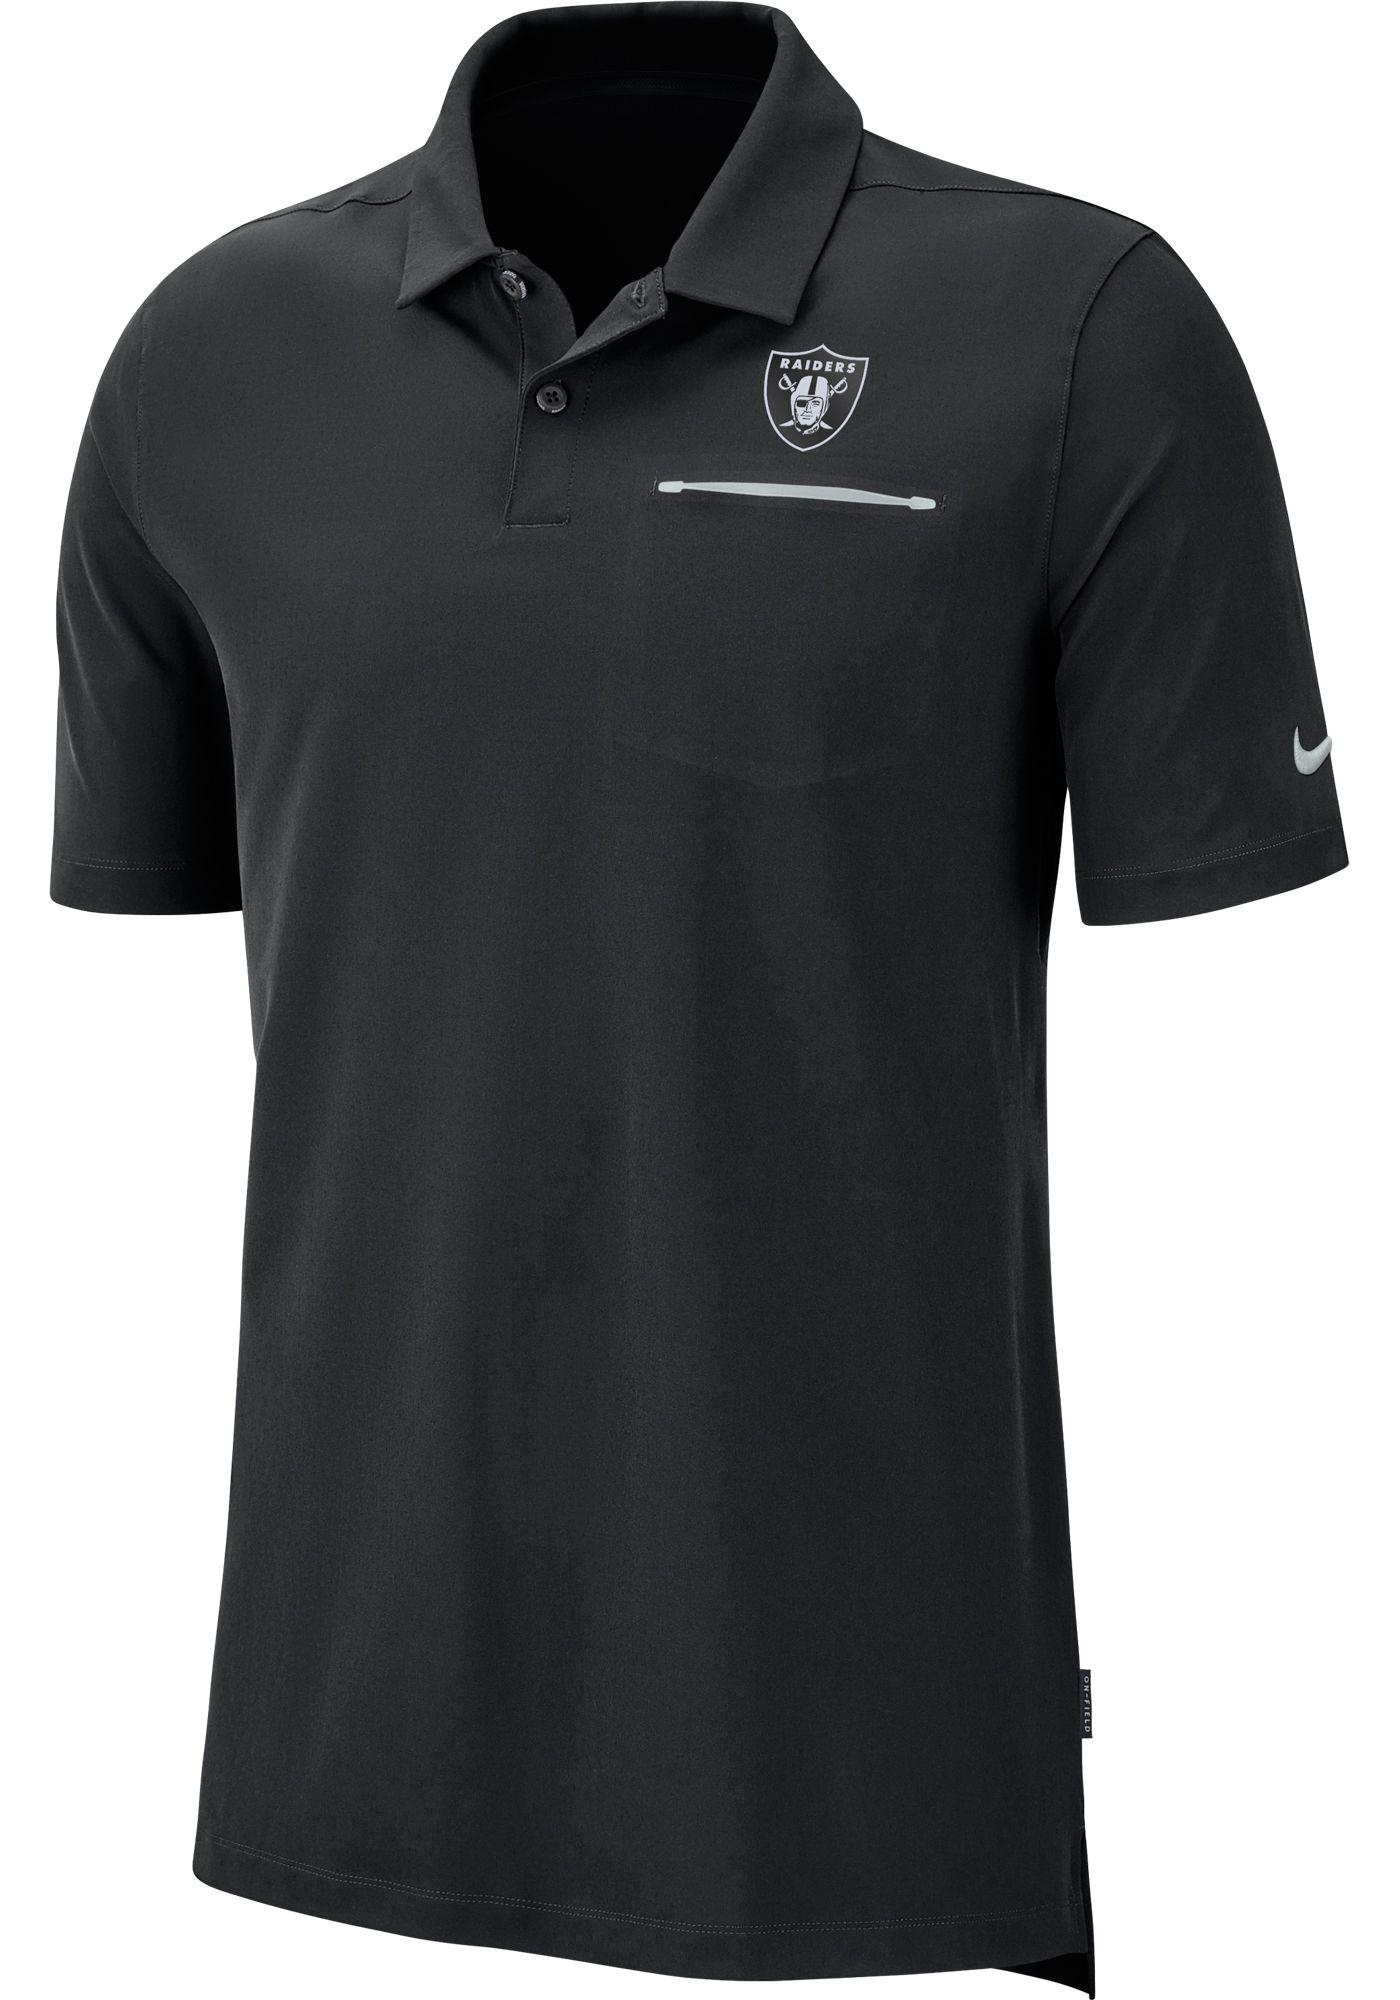 Nike Men's Oakland Raiders Sideline Elite Performance Black Polo